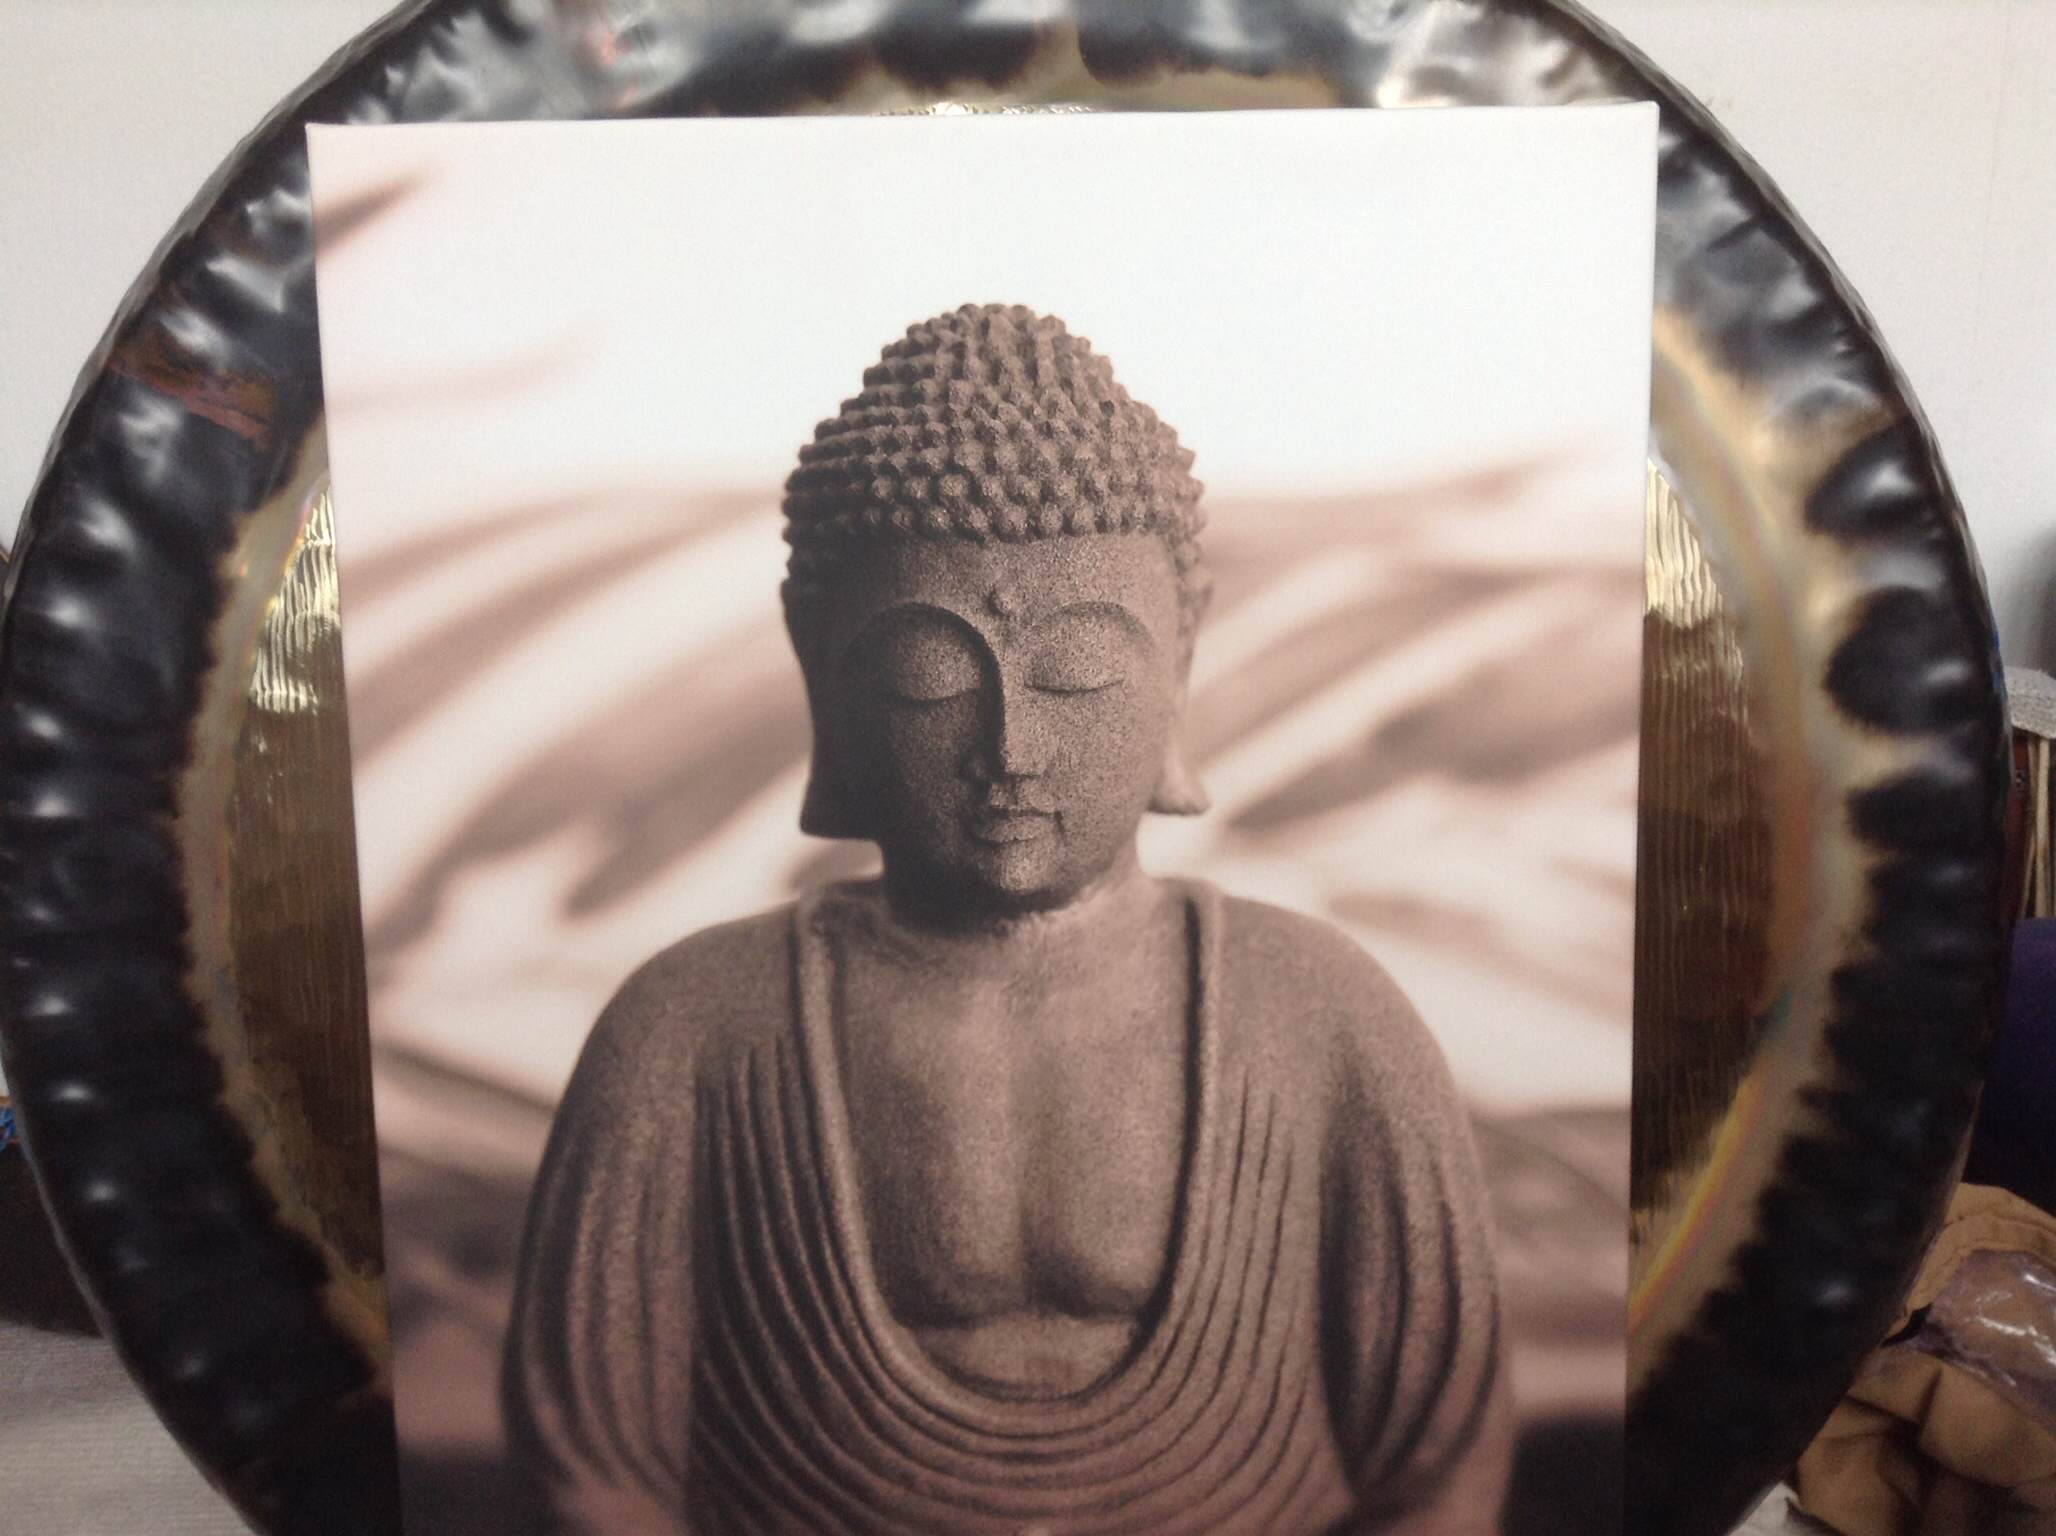 Intutieve Indiase massage- Kundalini yogastudio Gurbatschan Amersfoort